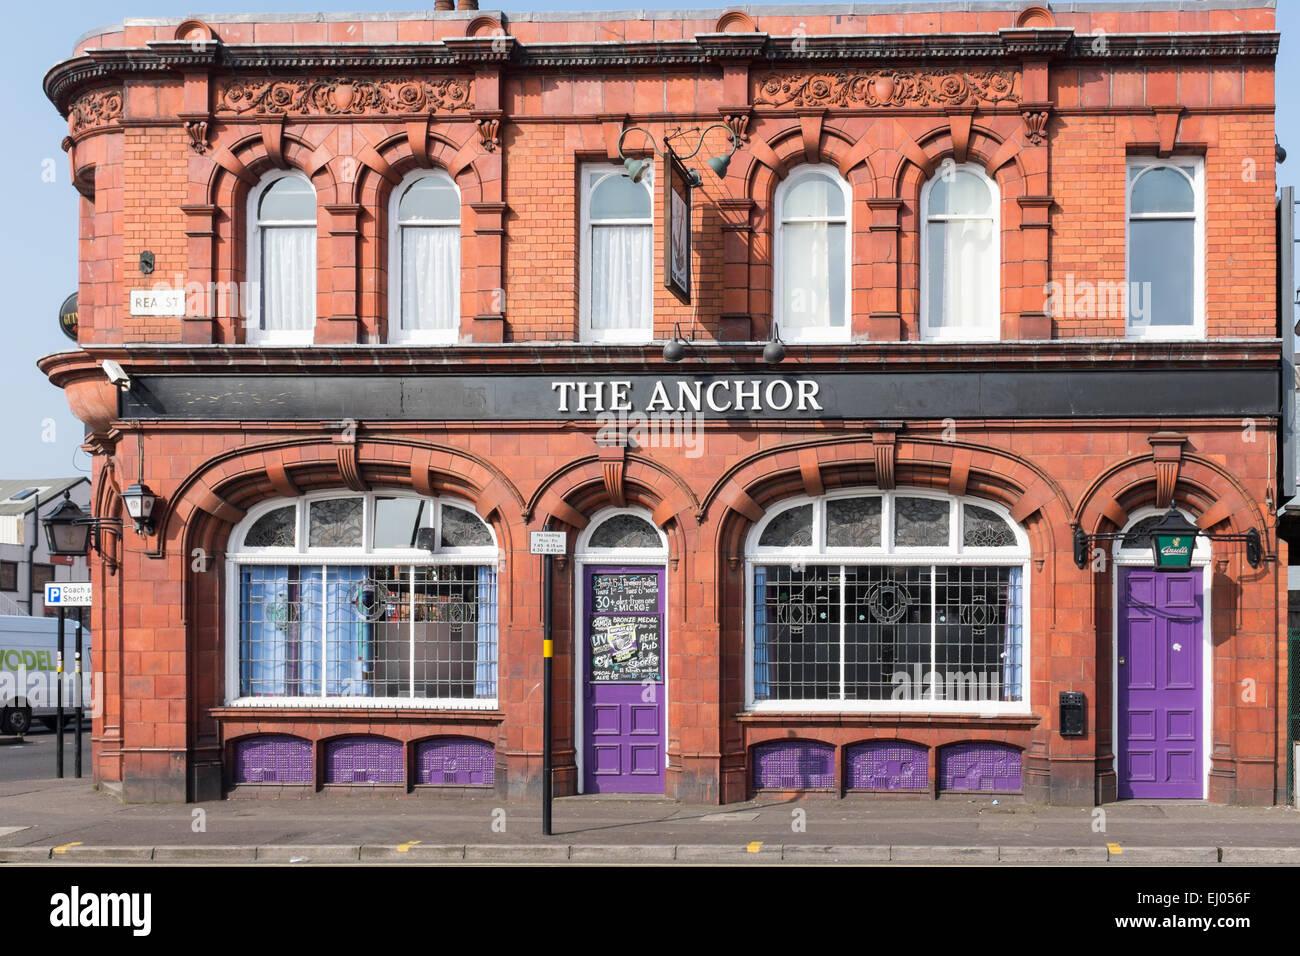 The Anchor public house in Rea Street, Digbeth, Birmingham - Stock Image